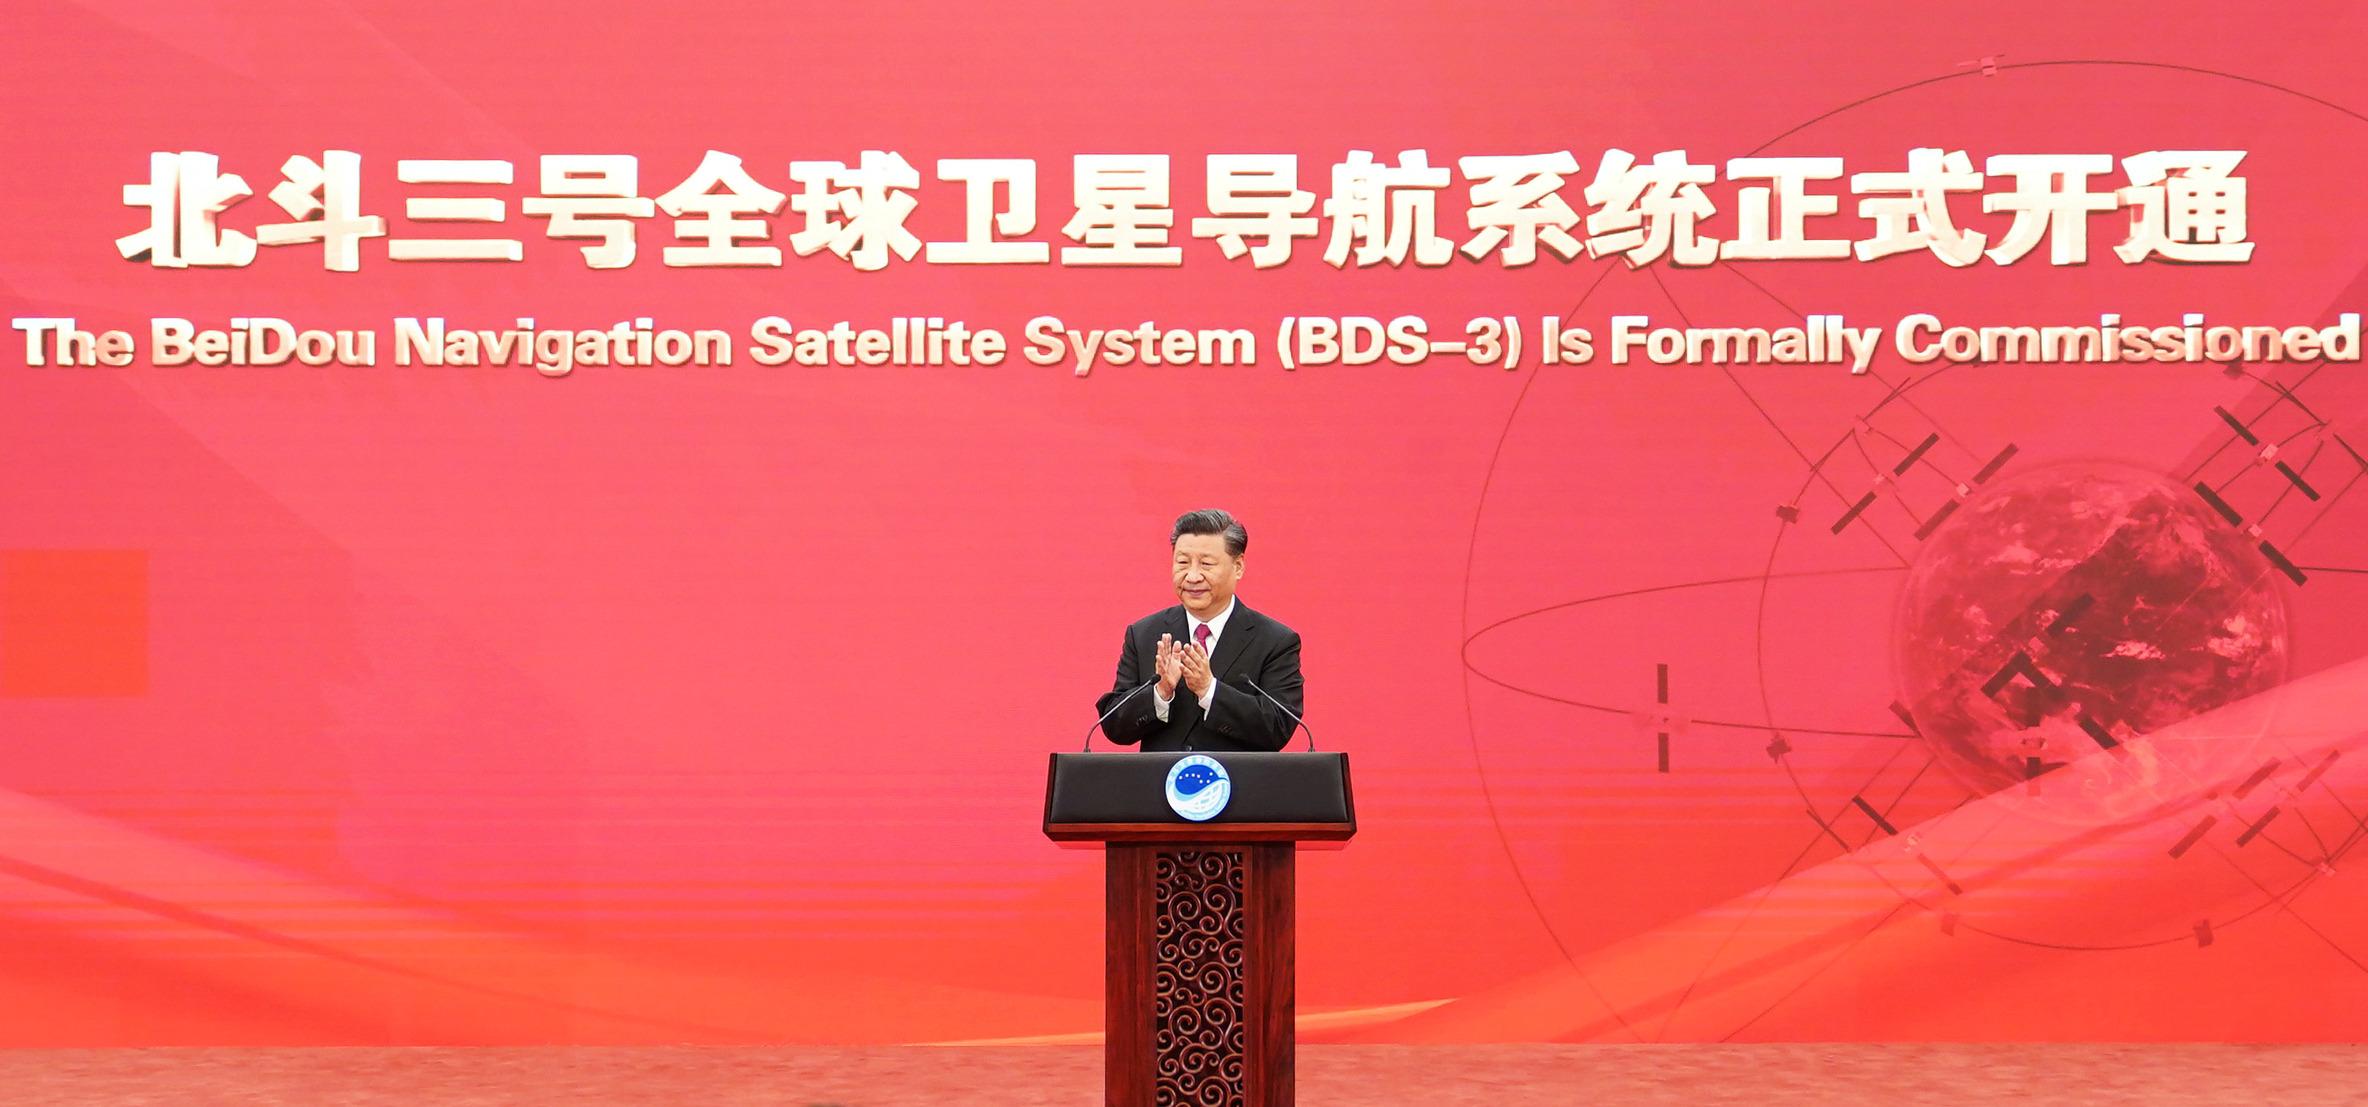 Xi anuncia oficialmente puesta en operación de Sistema de Navegación por Satélite BeiDou-3